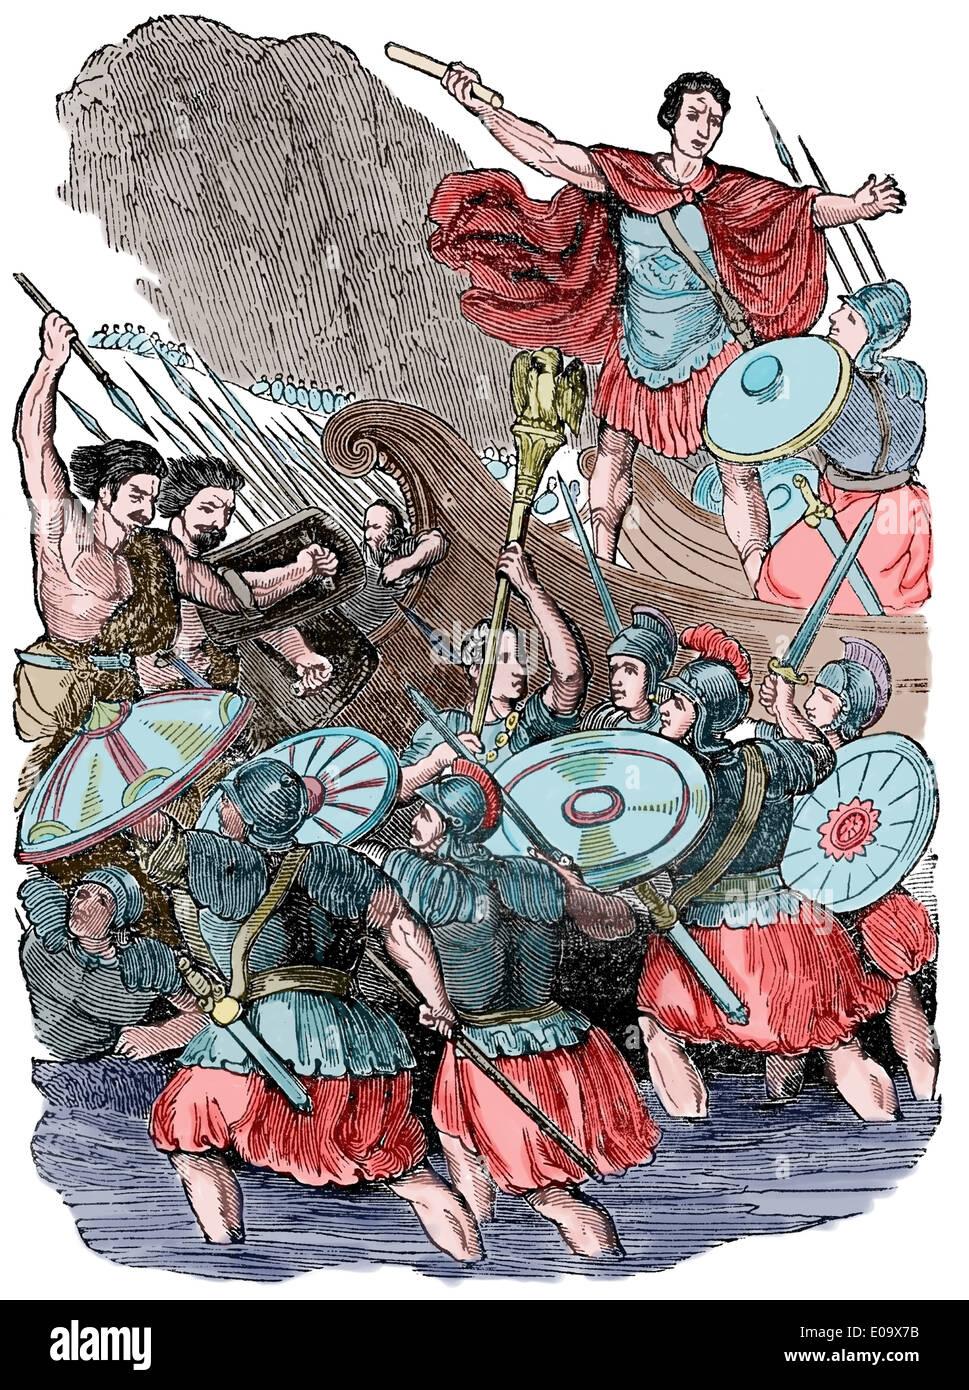 Invasion of Britain. Julius Caesar (100 BC-44 BC) in England. Disembark. Engraving. Color. - Stock Image